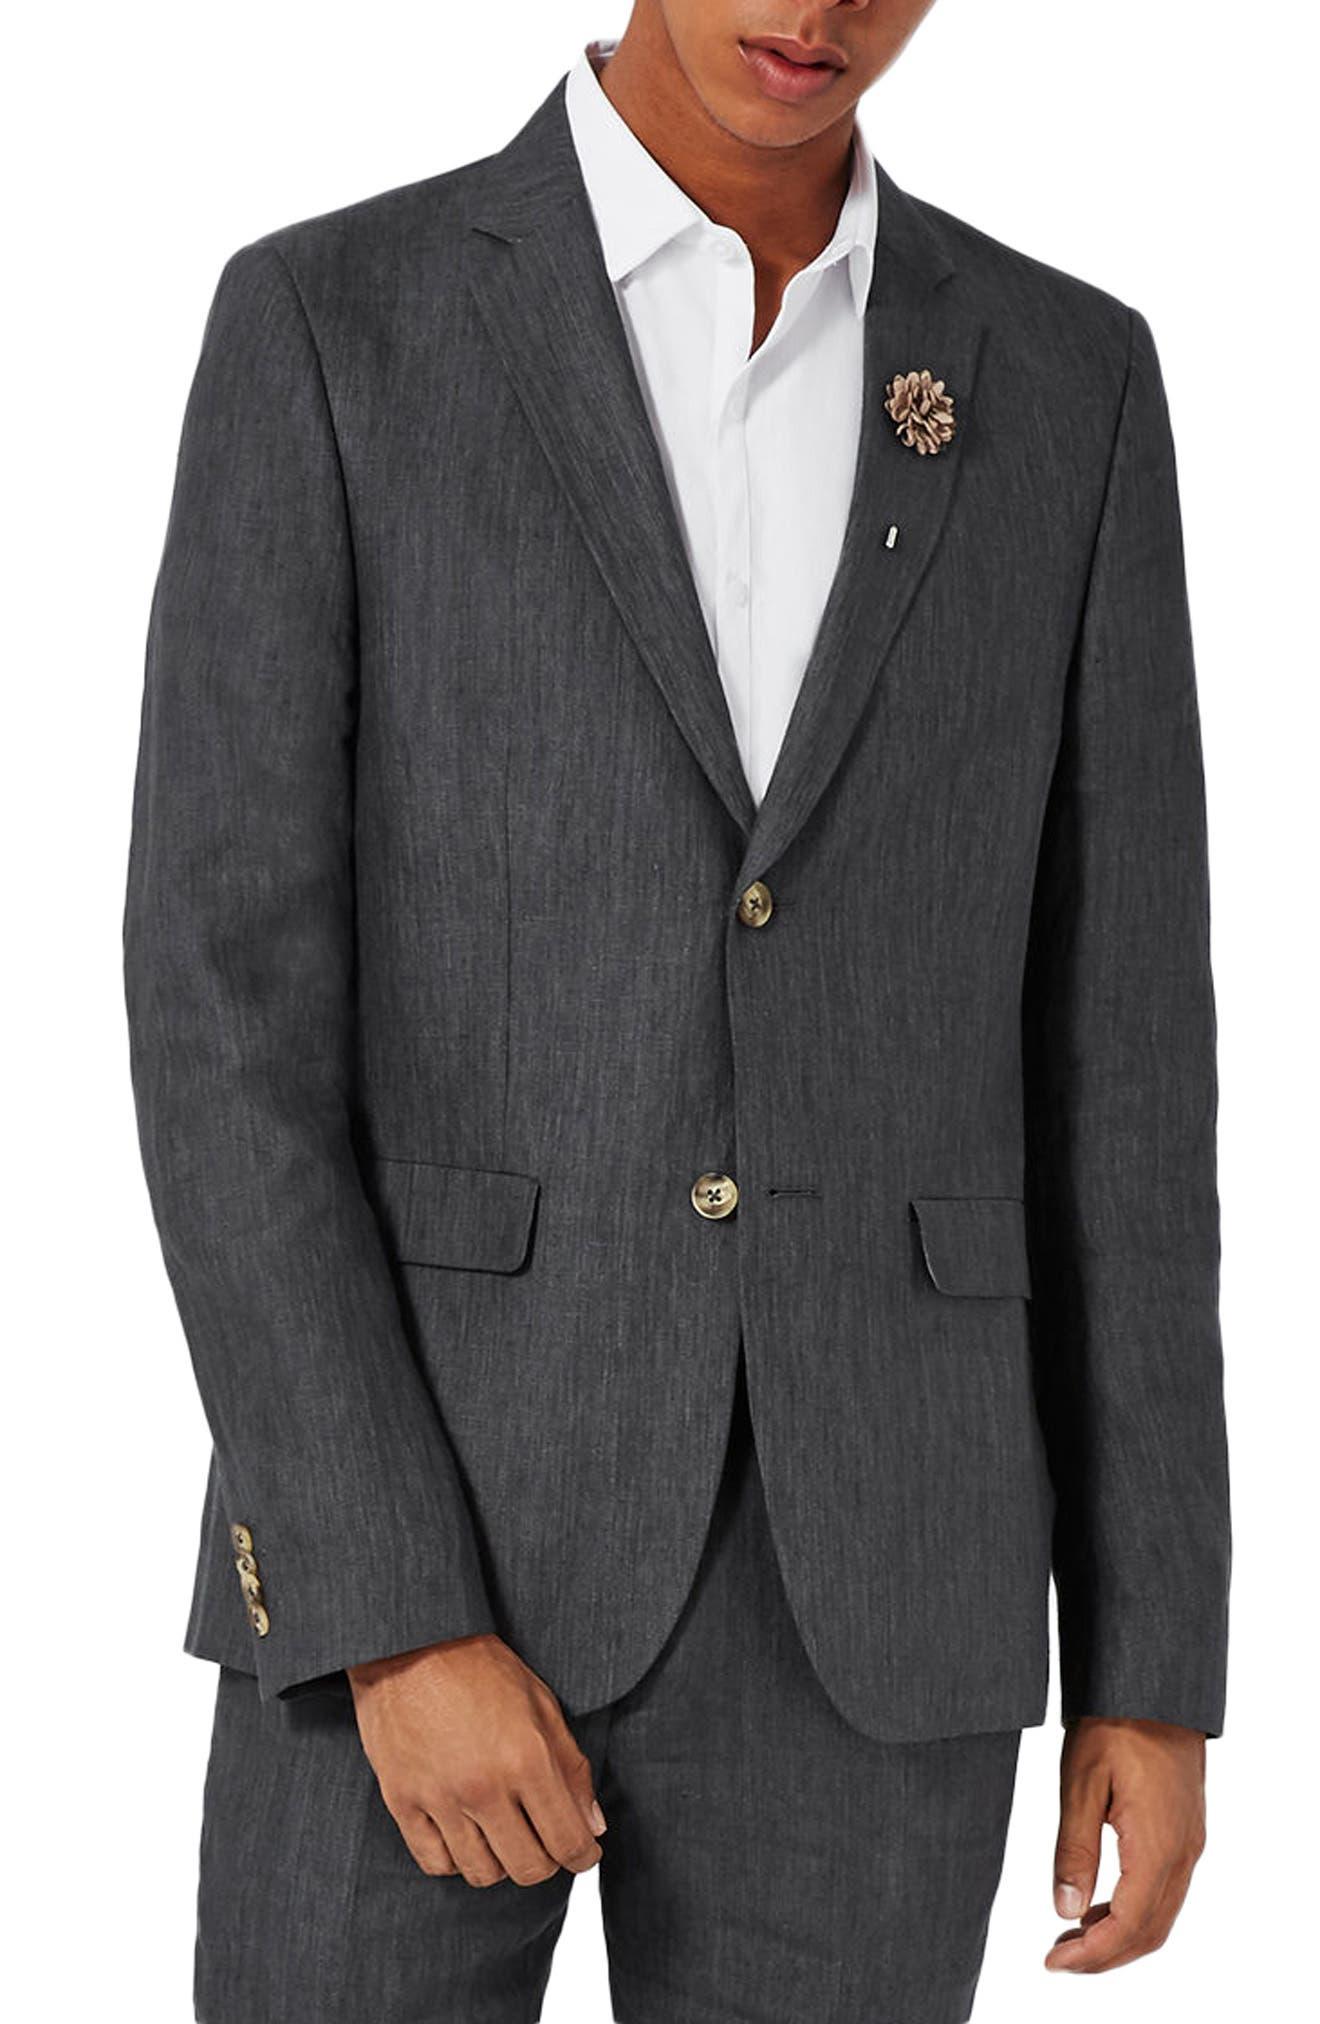 Alternate Image 1 Selected - Topman Skinny Fit Linen Suit Jacket